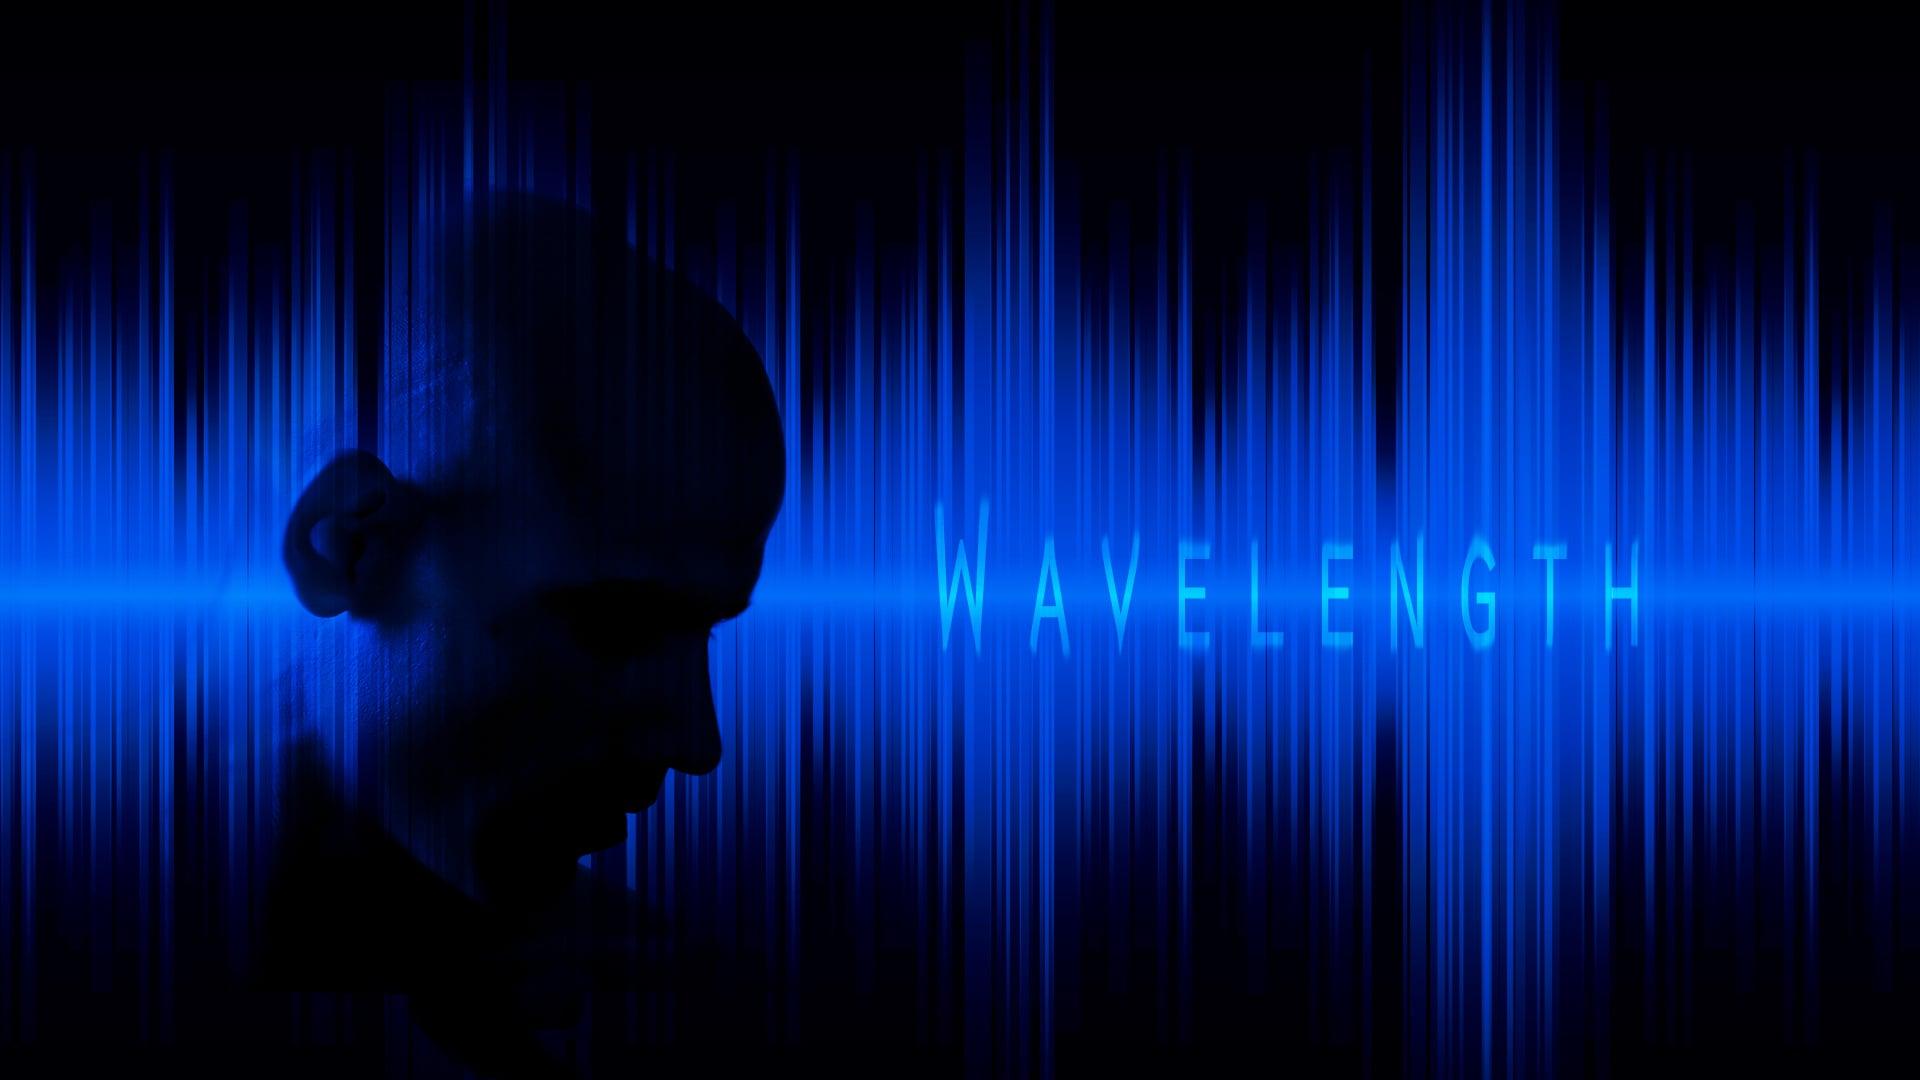 Wavelength - Week 2